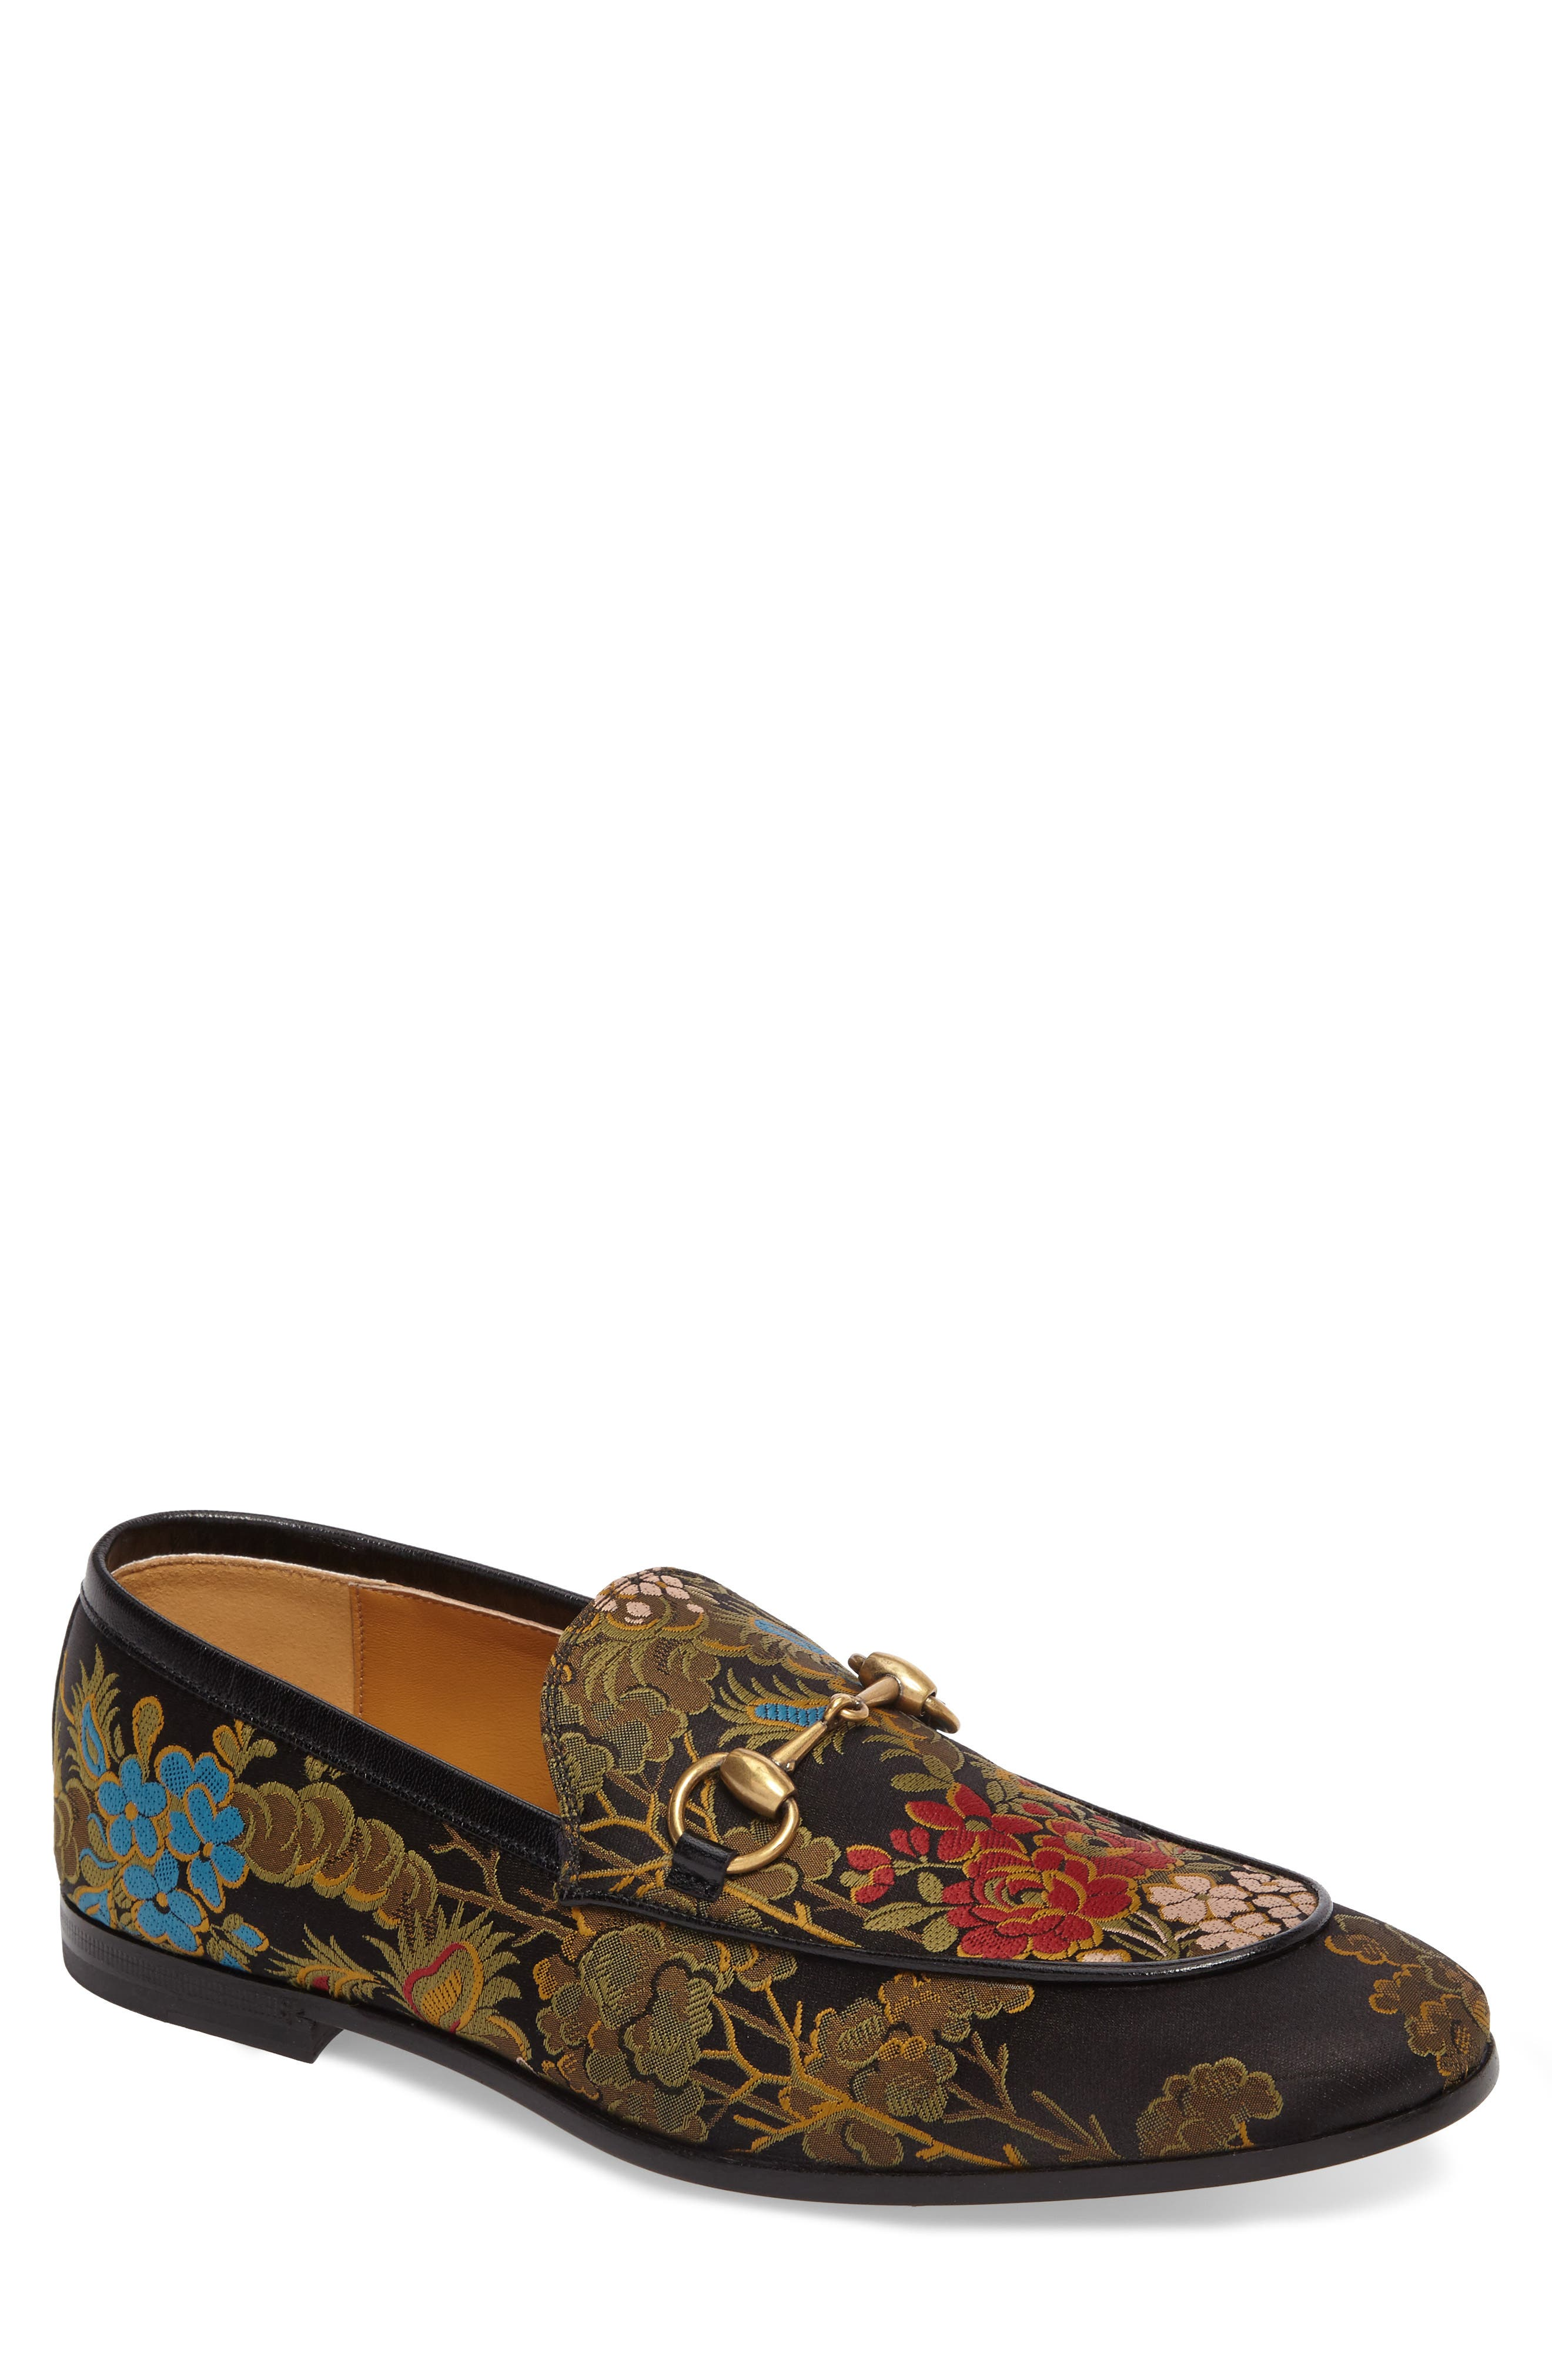 Alternate Image 1 Selected - Gucci Jordaan Jacquard Bit Loafer (Men)